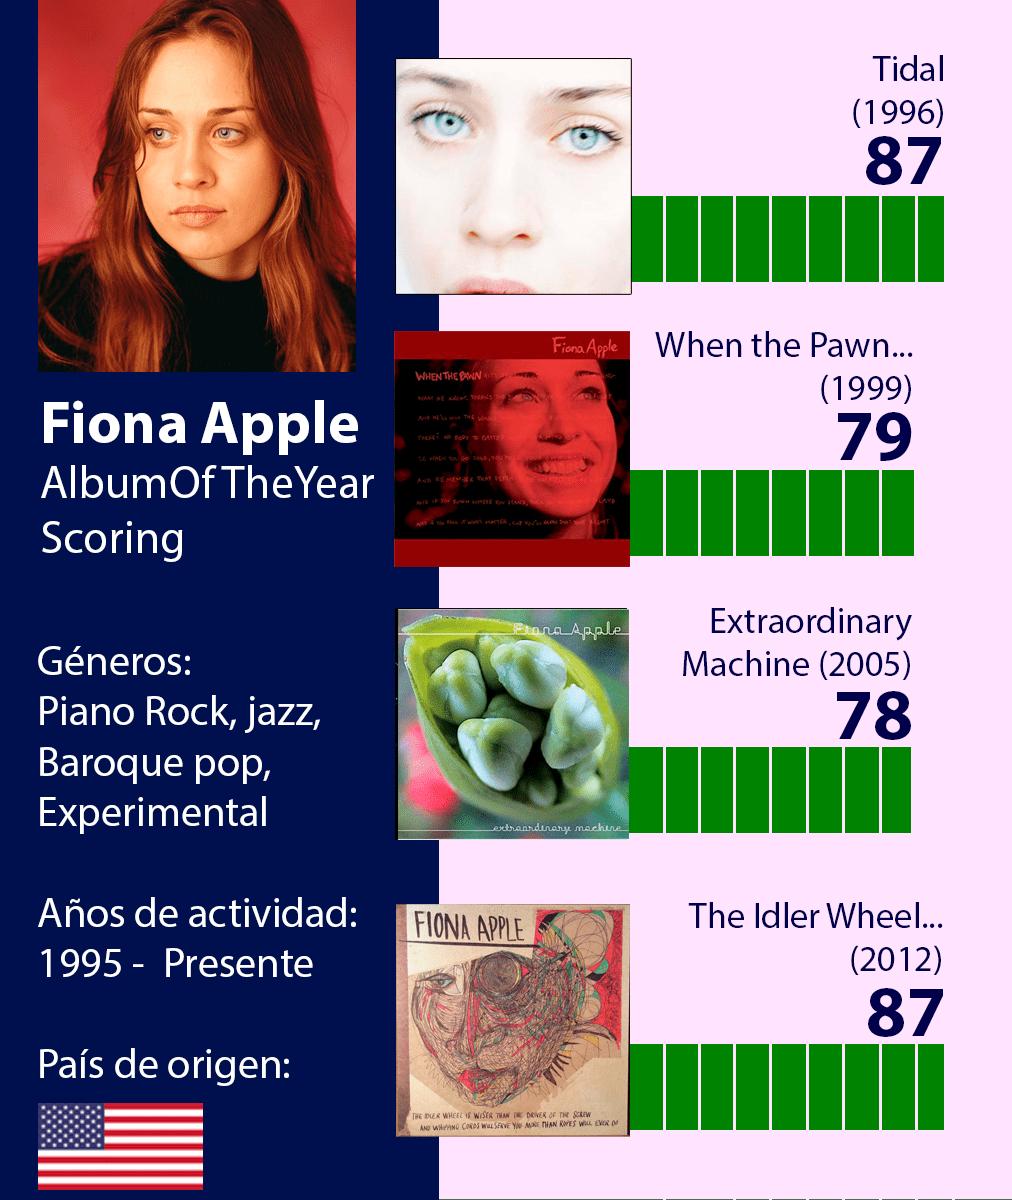 fiona apple discograhpy chart